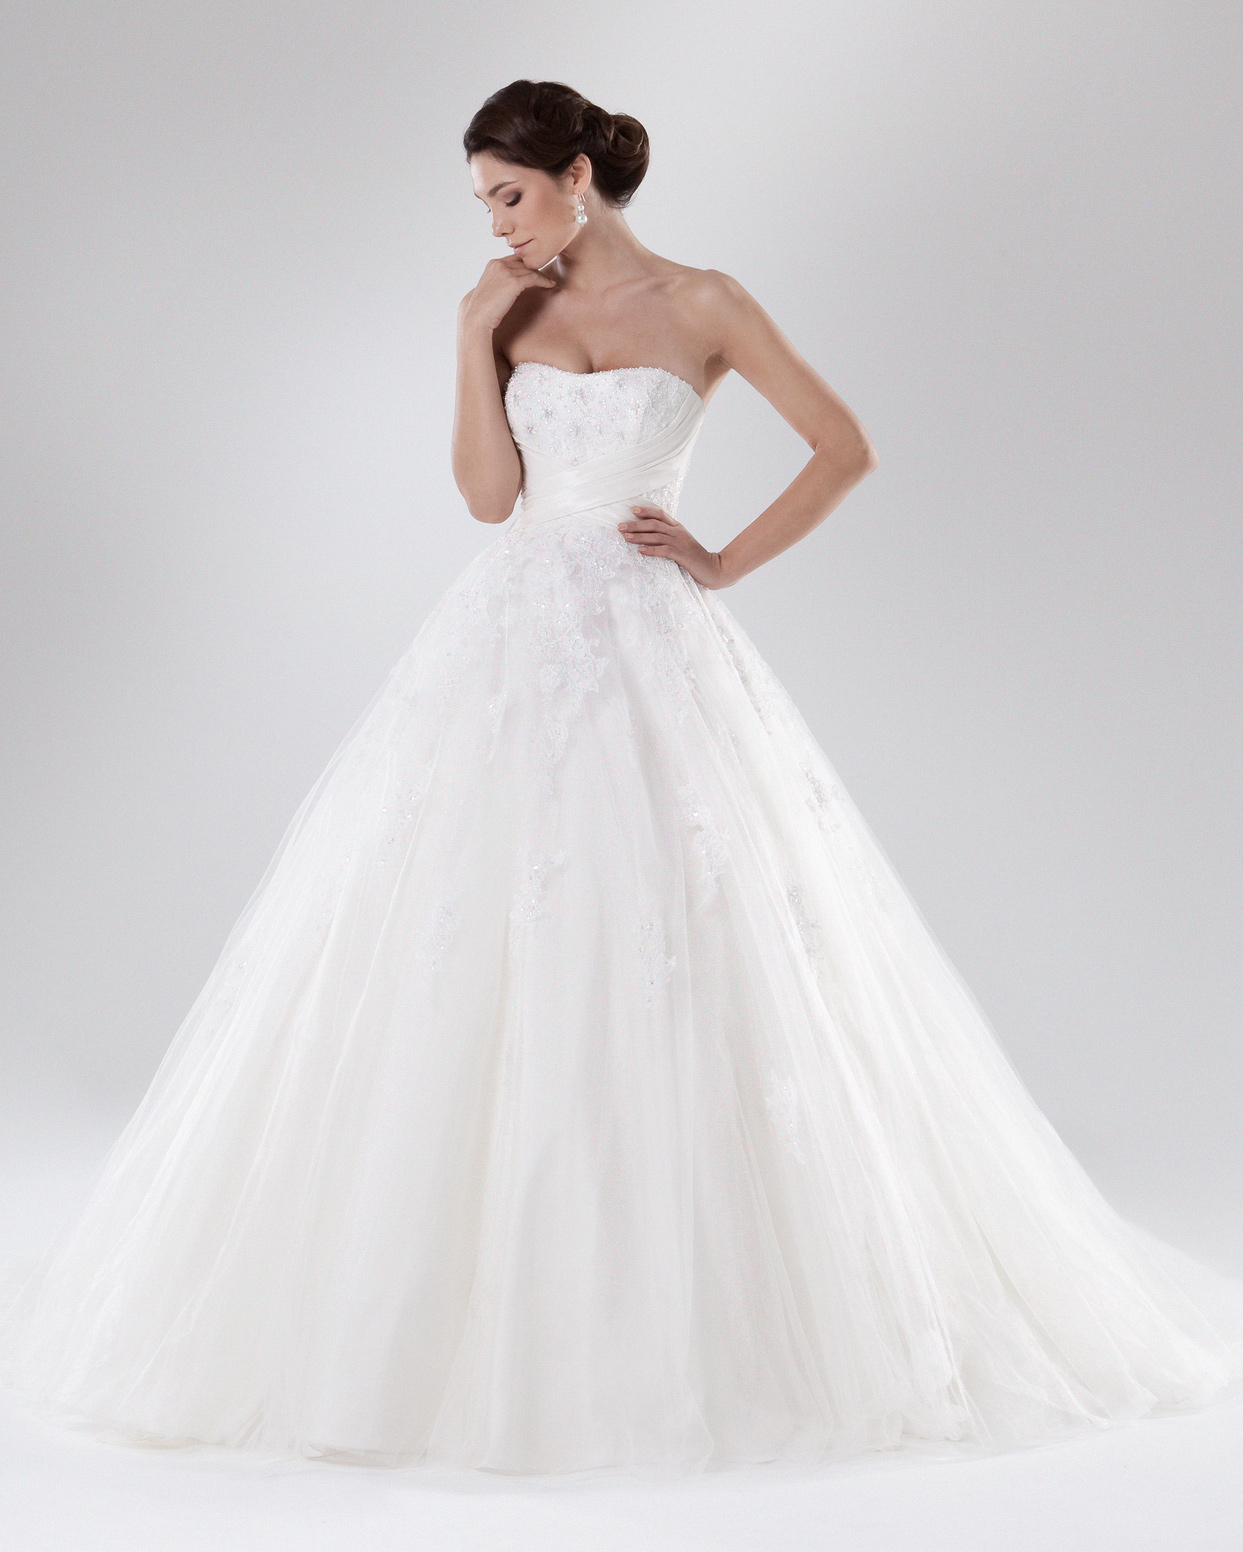 ellis-bridal-11286.jpg